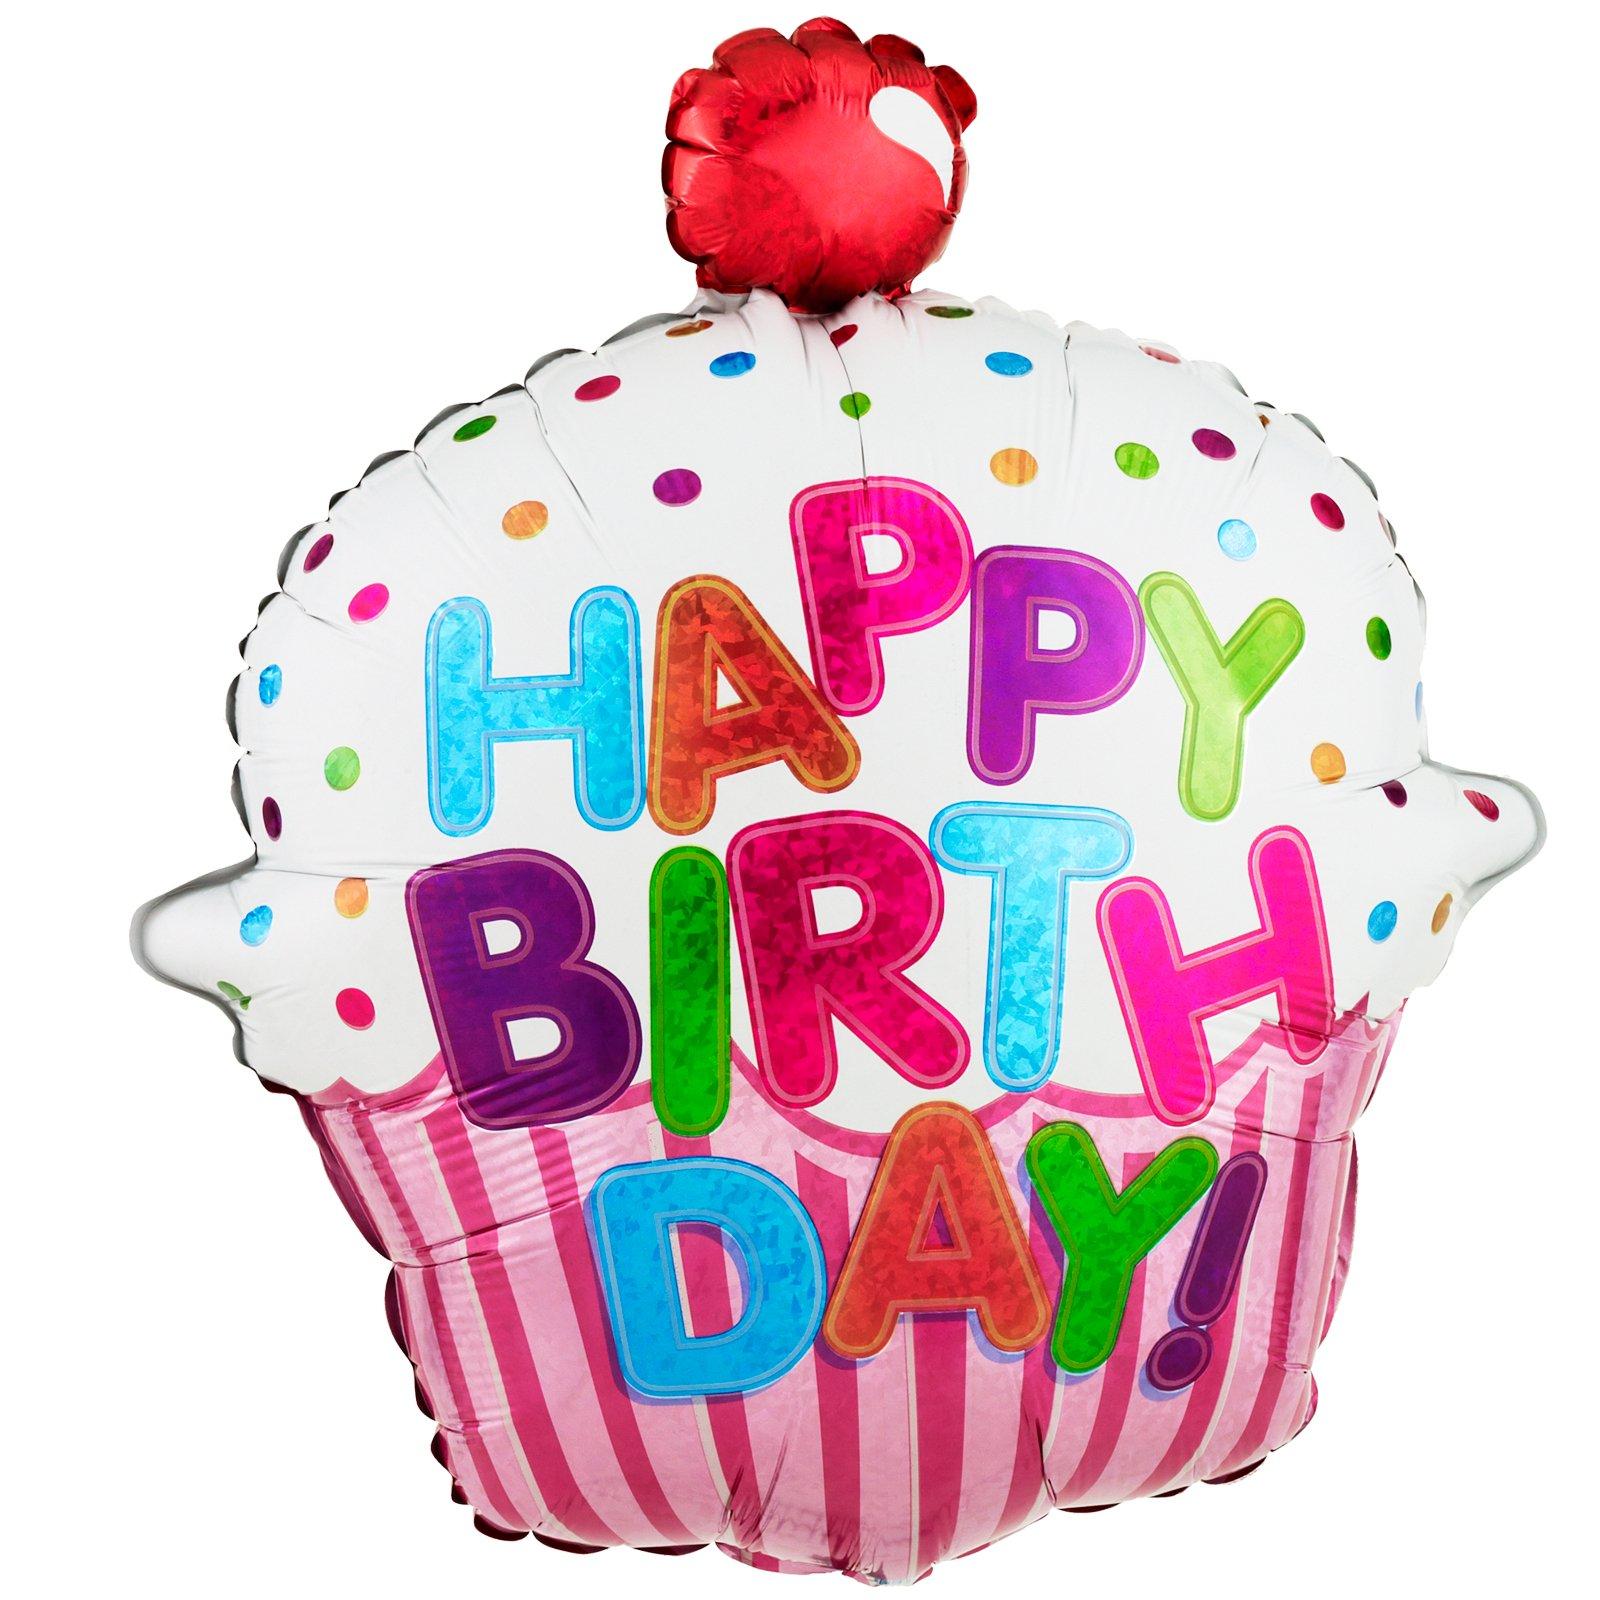 http://3.bp.blogspot.com/-YglT9VlXDAs/UUXrrjb9XyI/AAAAAAABMkI/bJYYUS9Mxtw/s1600/hinh+nen+sinh+nhat,+happy+birthday+wallpaper+(18).jpg